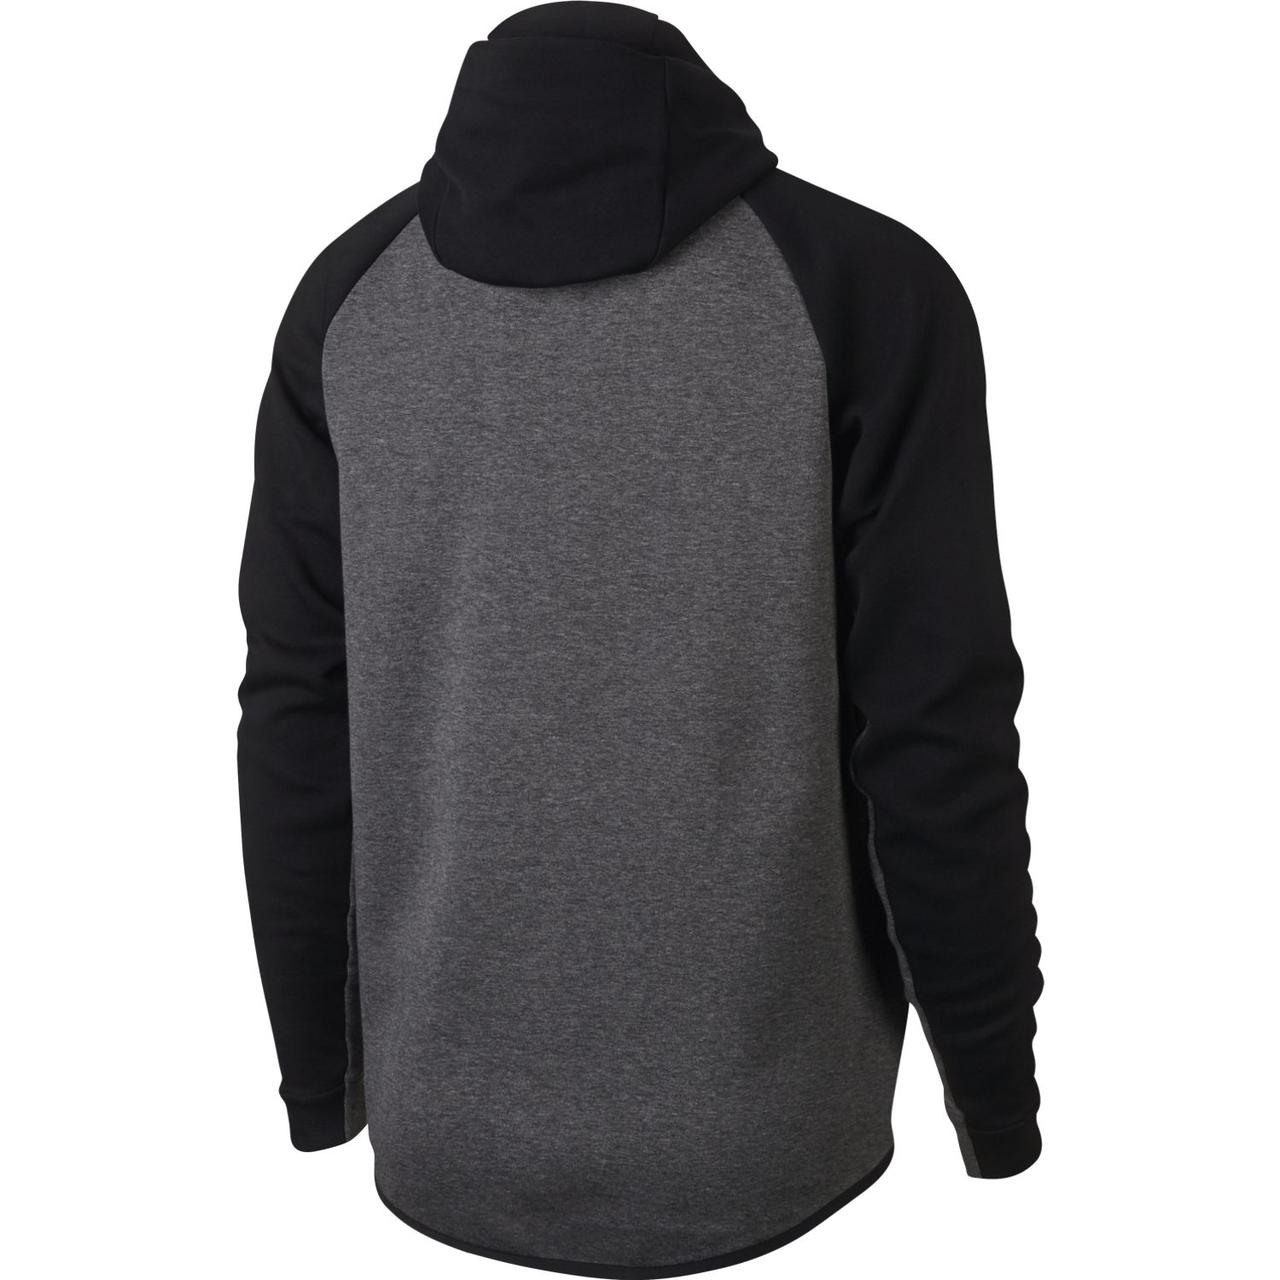 f5692360 Купить Мужская толстовка NIKE NSW Tech Fleece (Артикул: 885904-010 ...